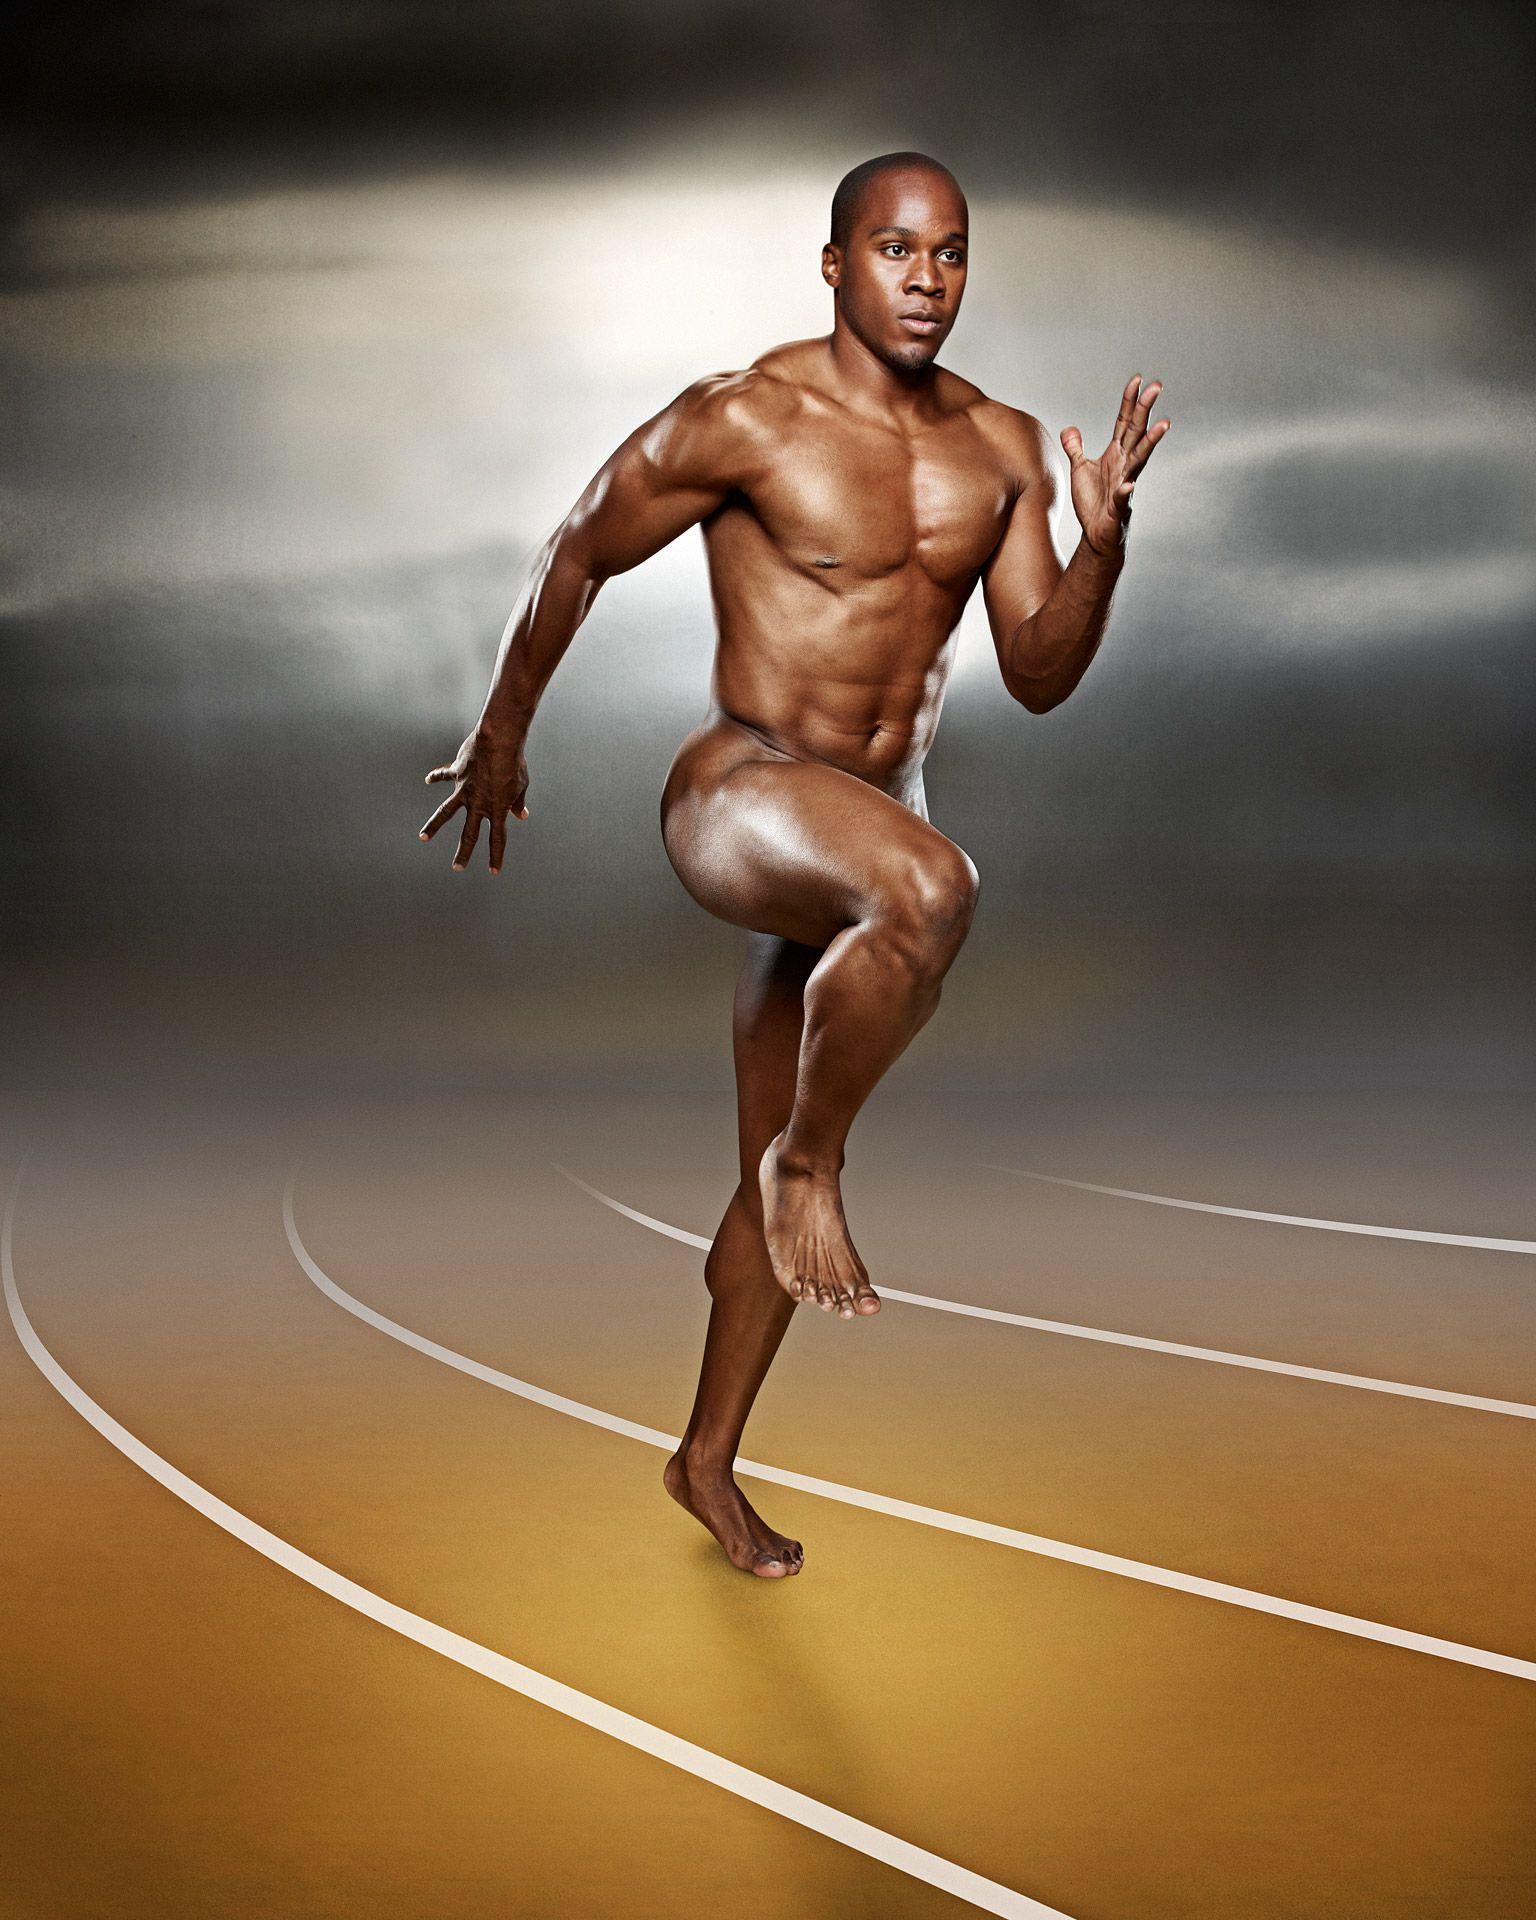 athletic-nude-people